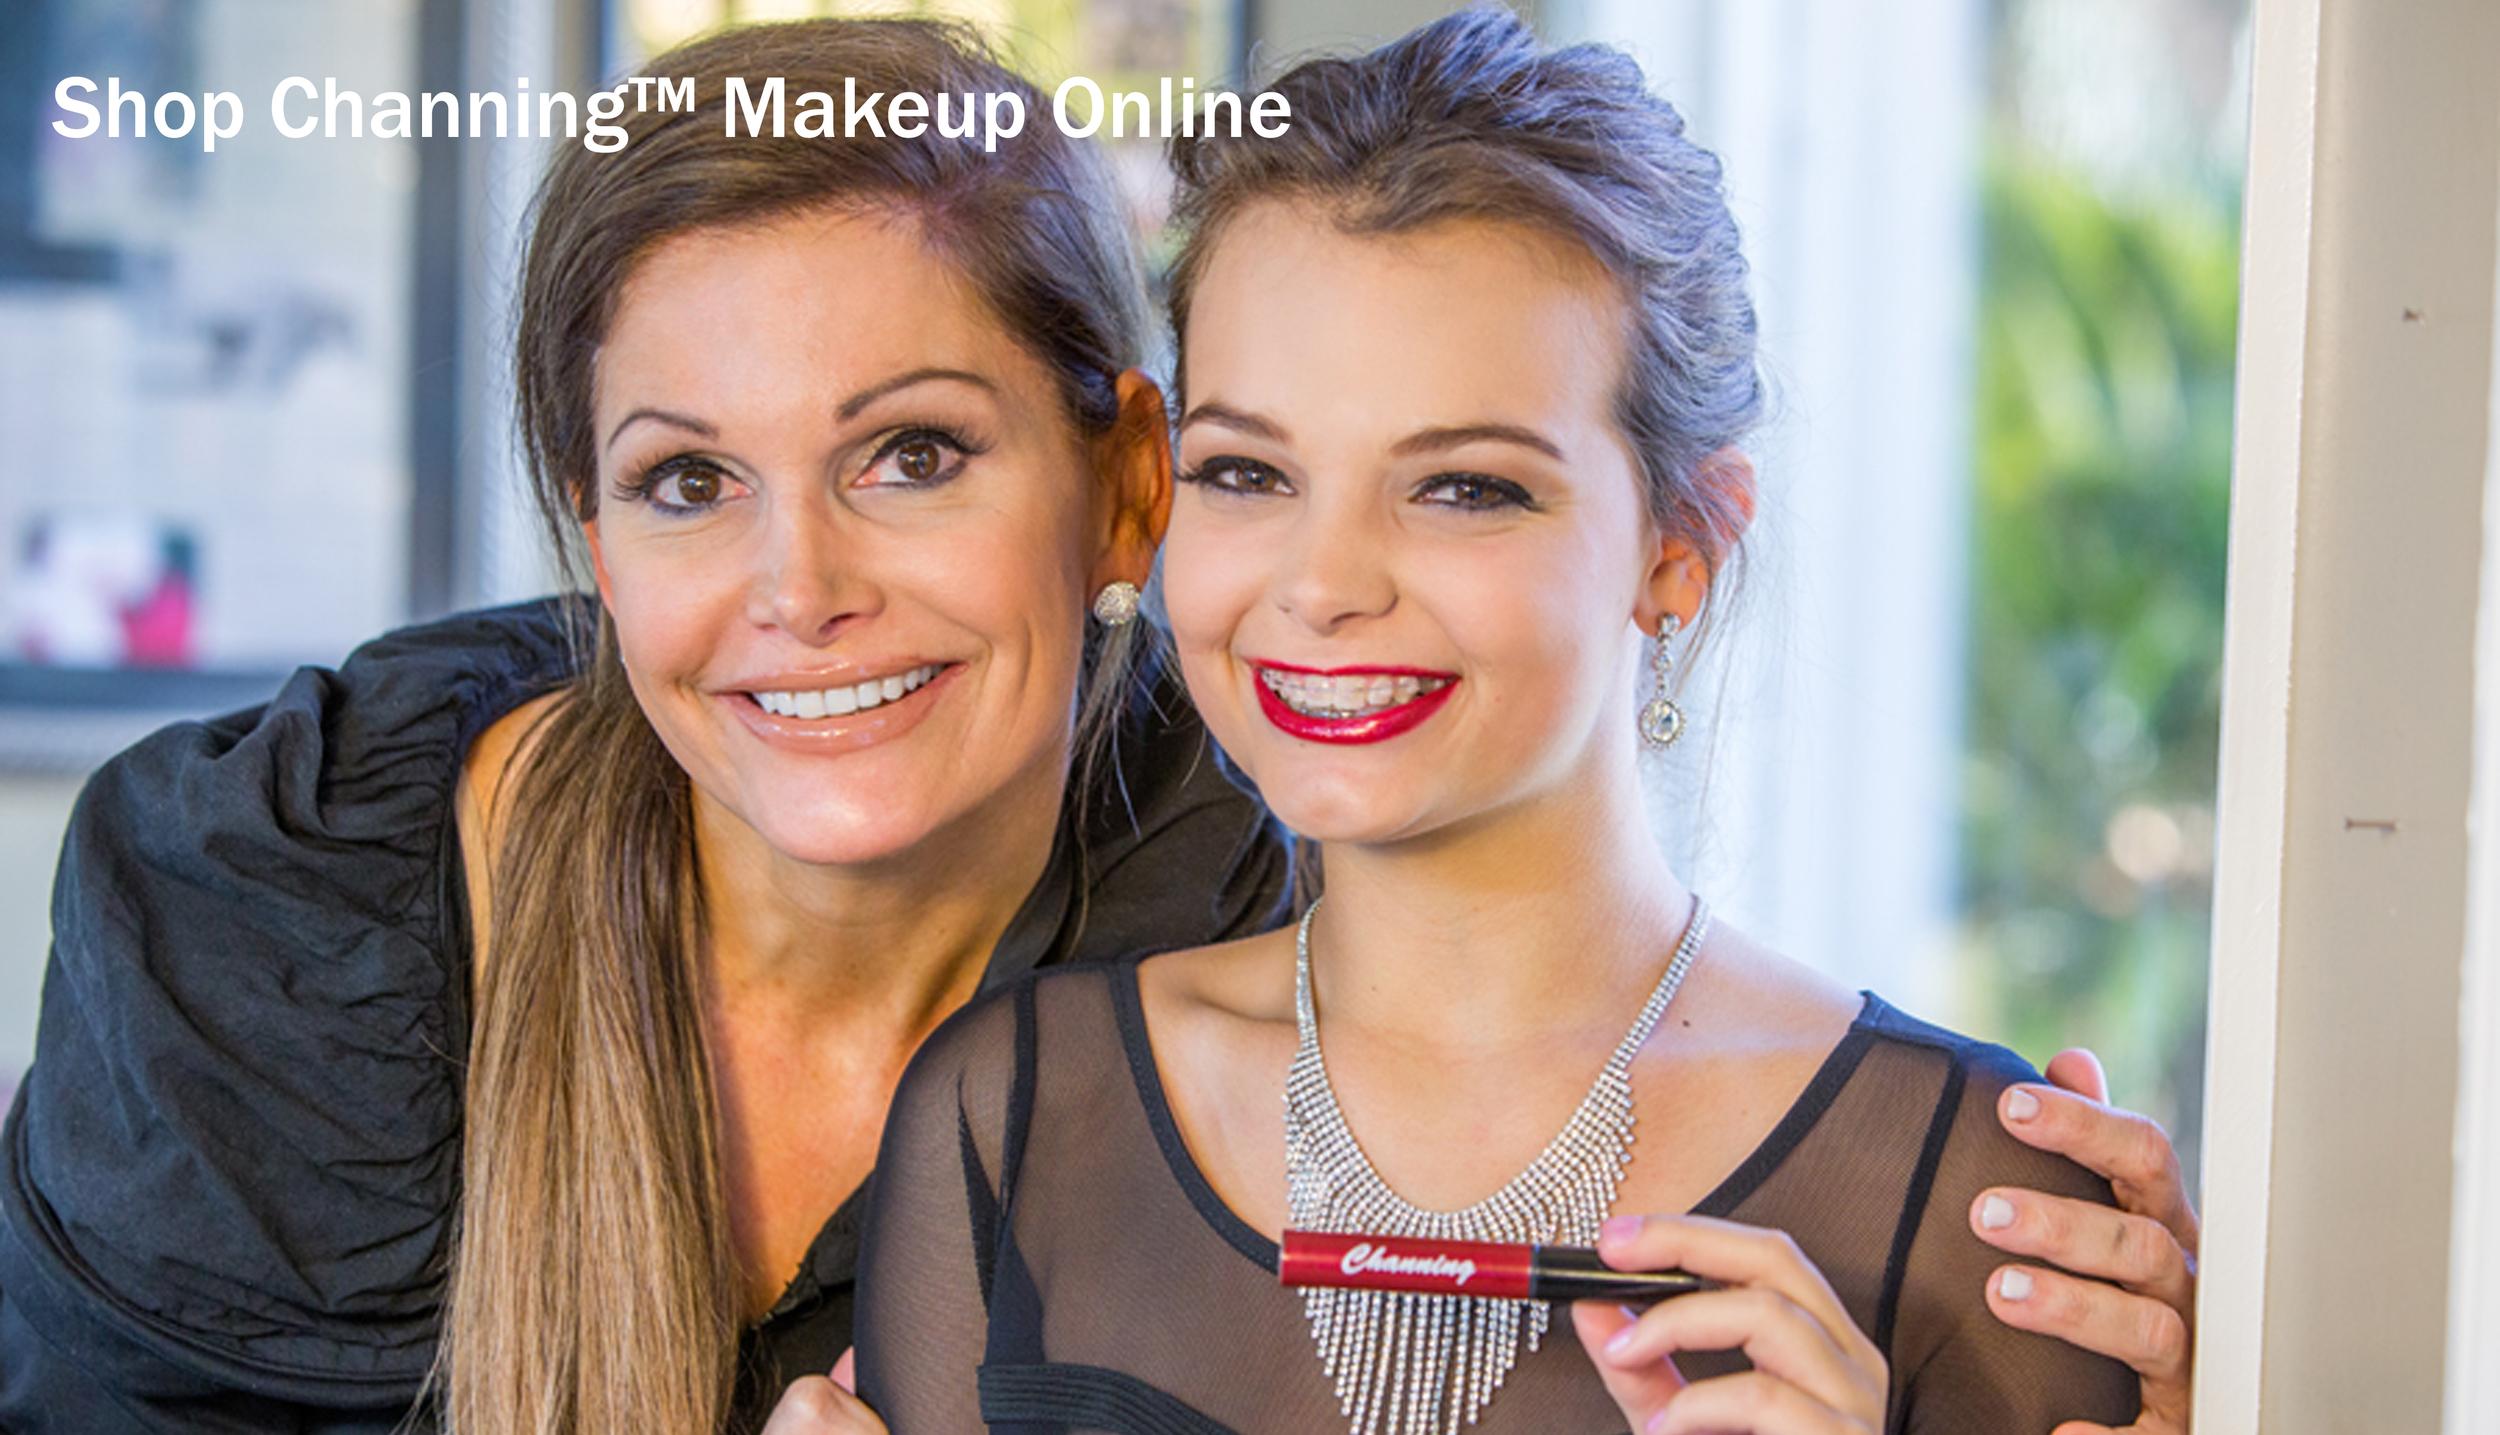 Shop Channing Makeup copy.jpg